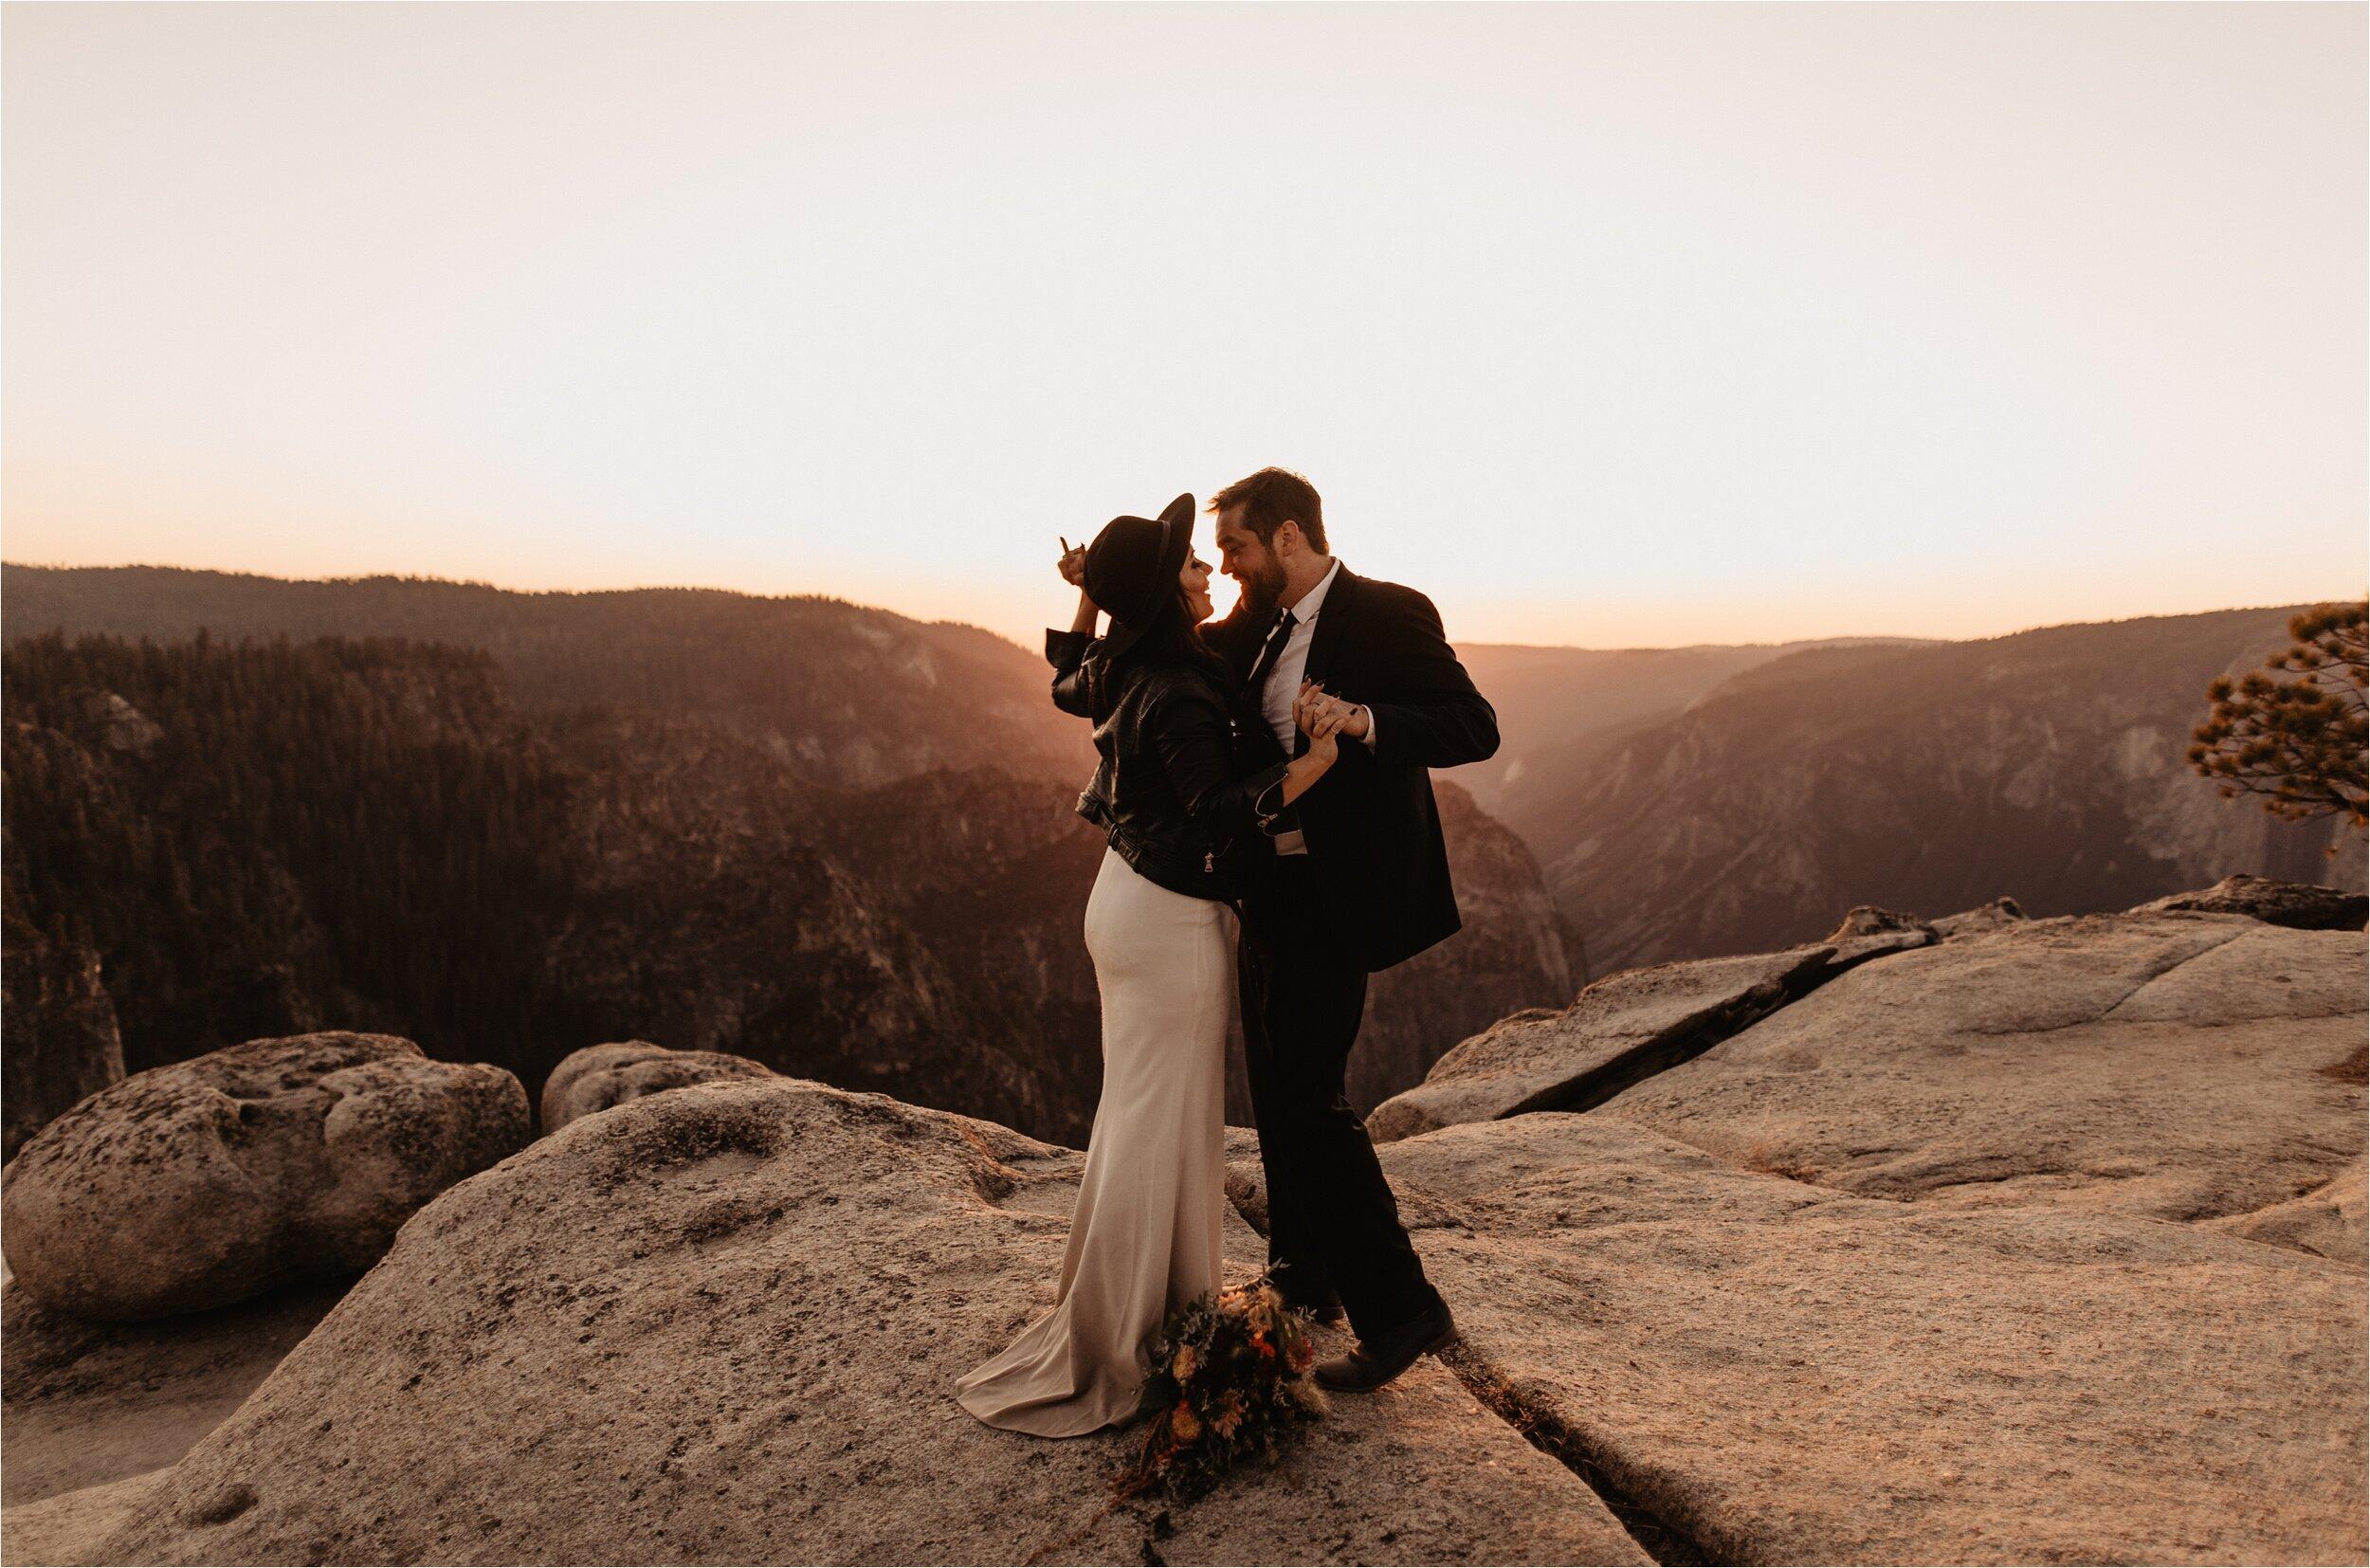 glacier-point-yosemite-elopement-ceremony_0074.jpg